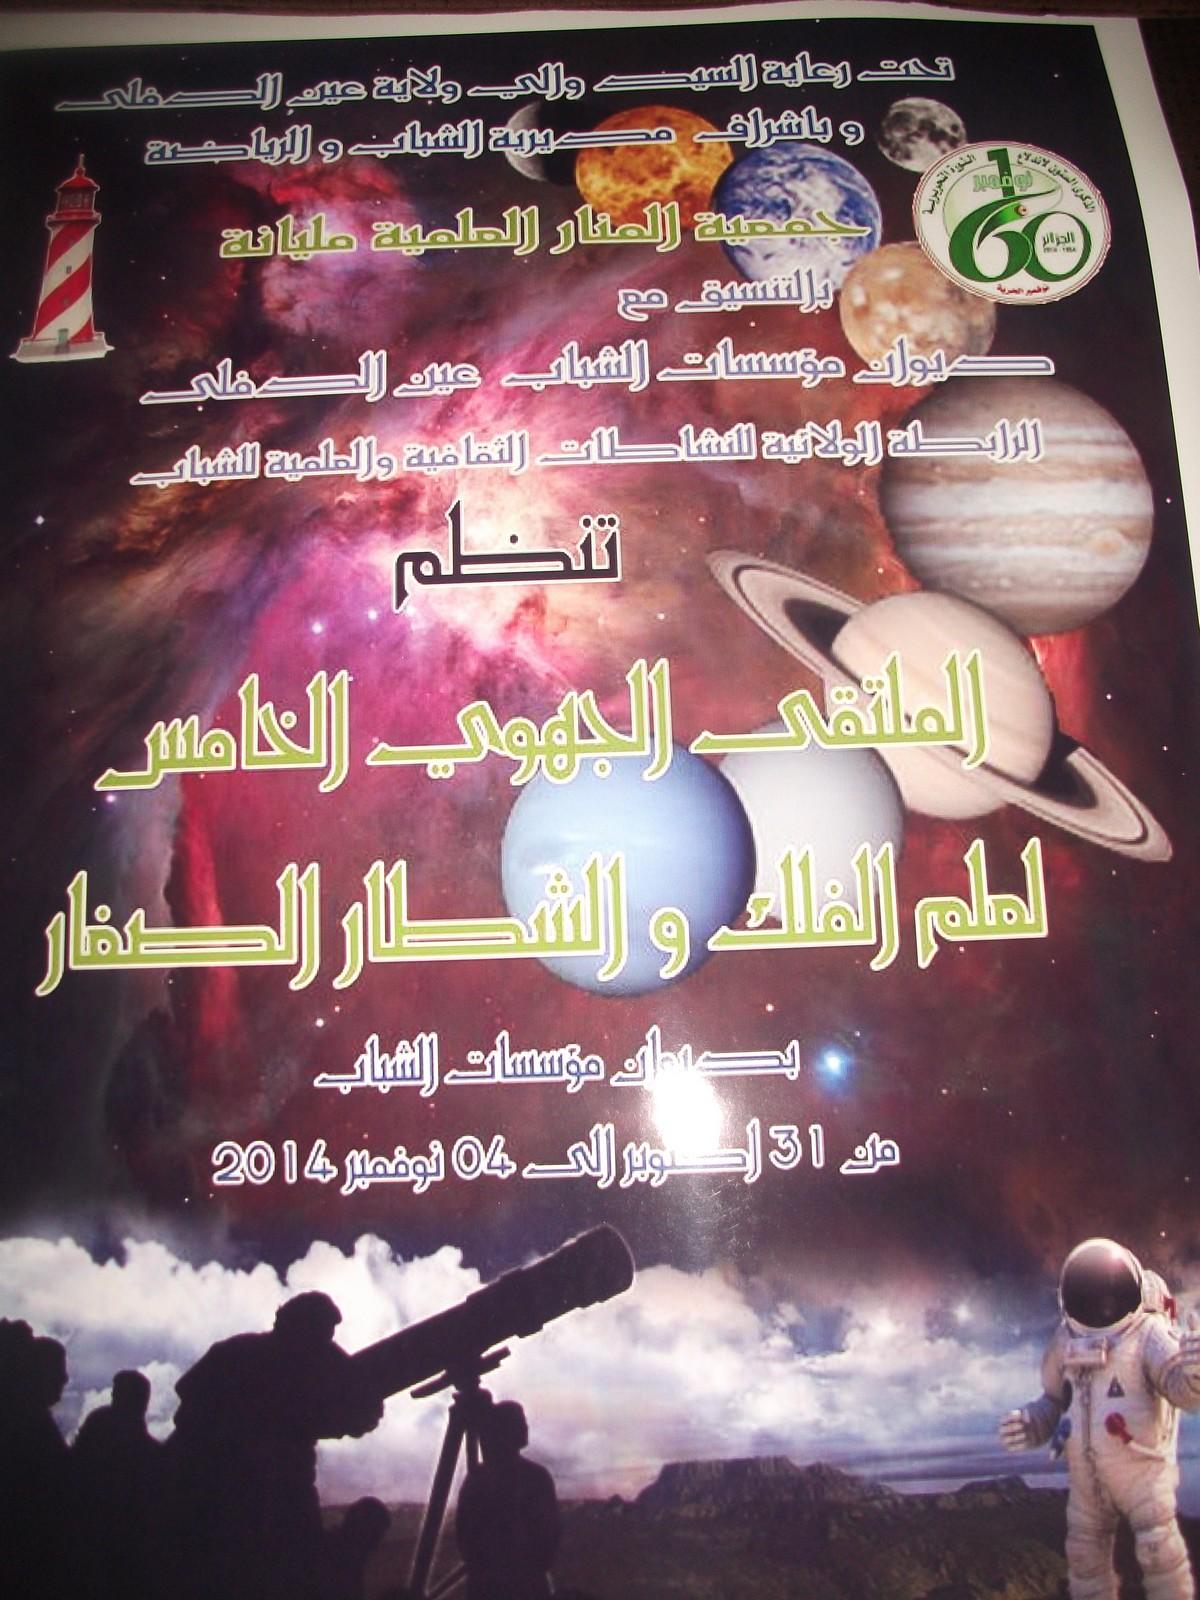 Rencontre regionale de la cinquieme edition de l astron omie